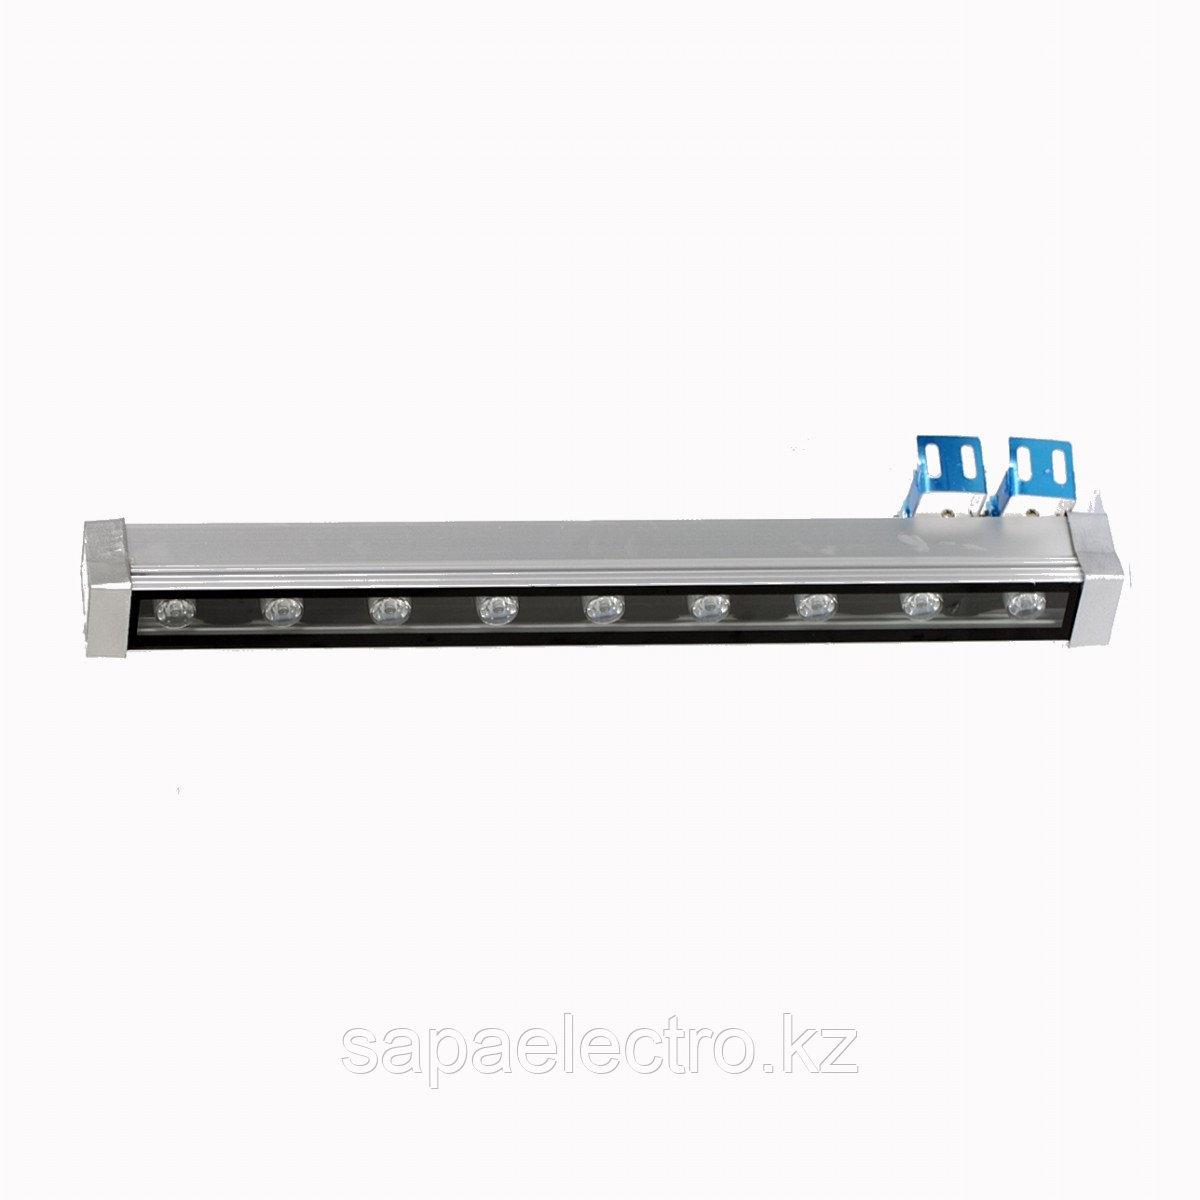 Prozh-r LED WW01 10W 50sm 3000K IP65 (TT) 40sht